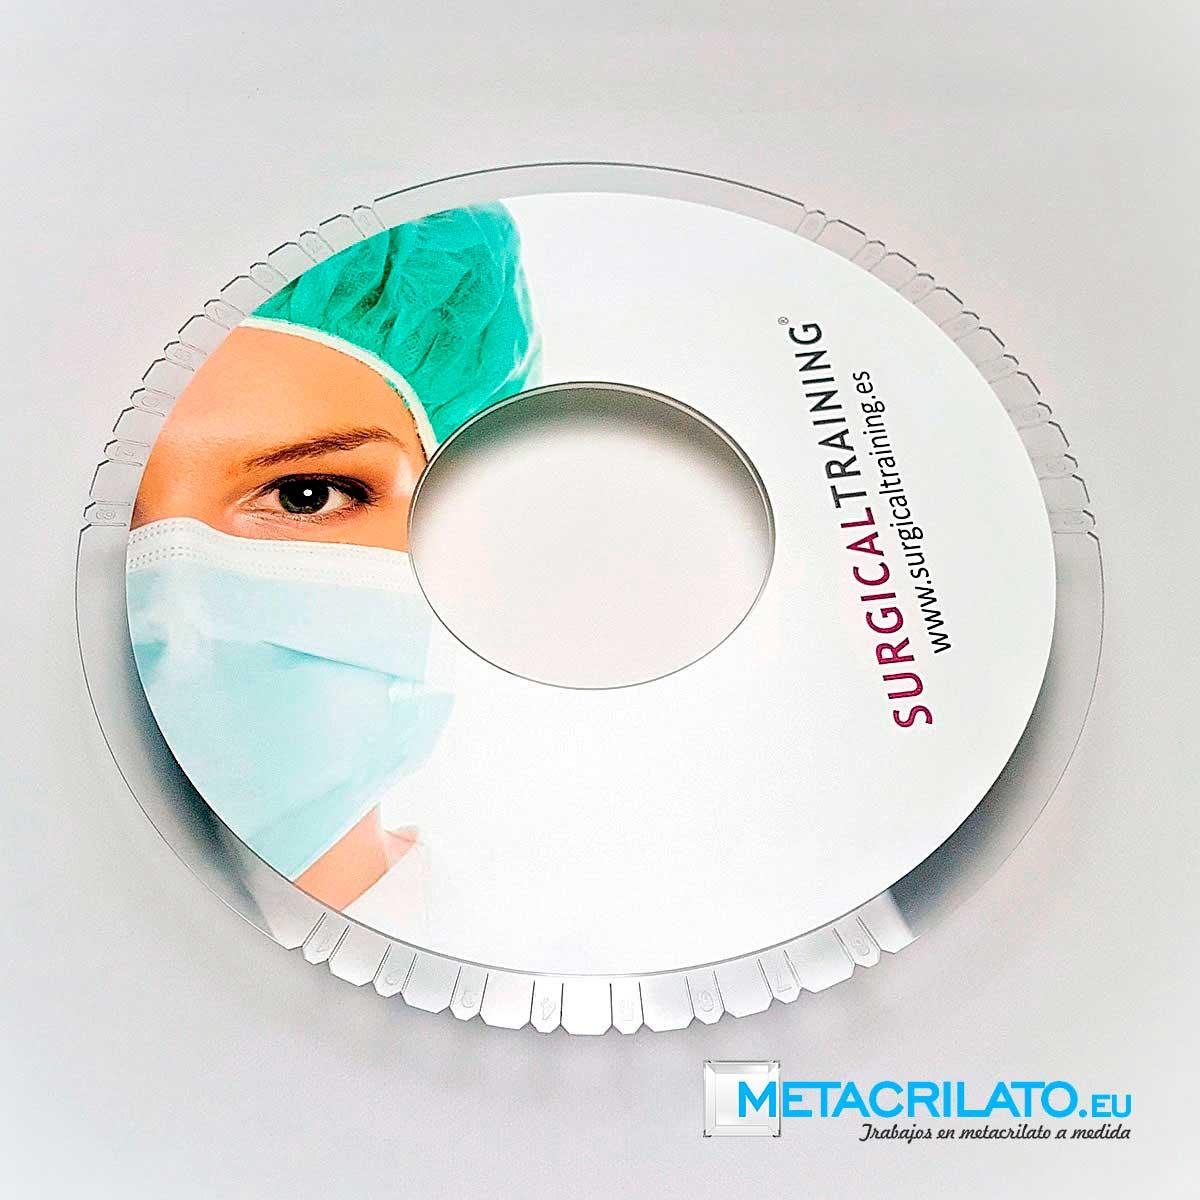 Medicina metacrilato